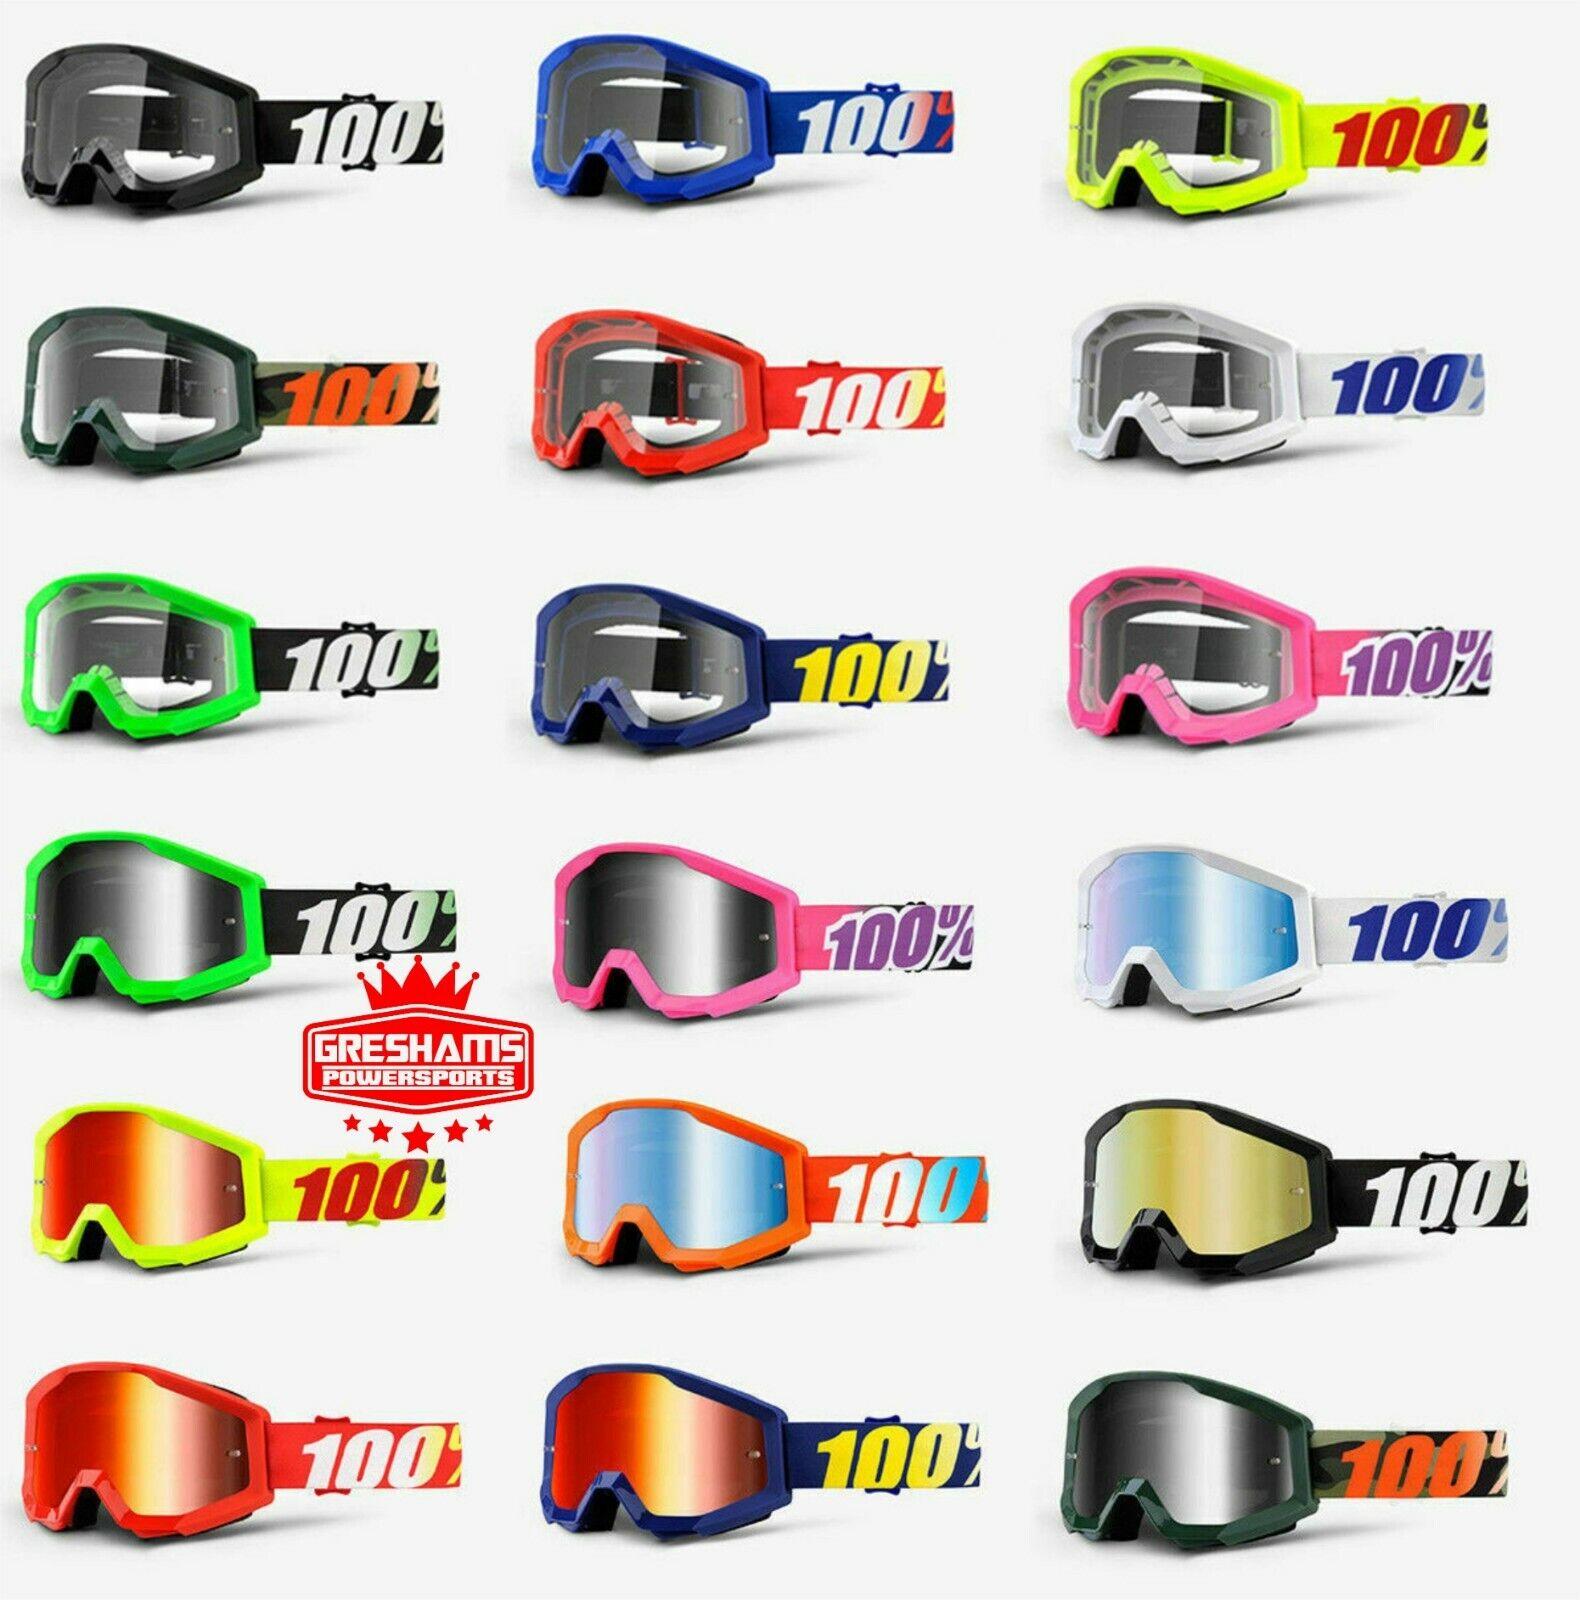 100/% Percent NEW Mx Strata Arkon Clear Lens Motocross Dirt Bike MTB BMX Goggles